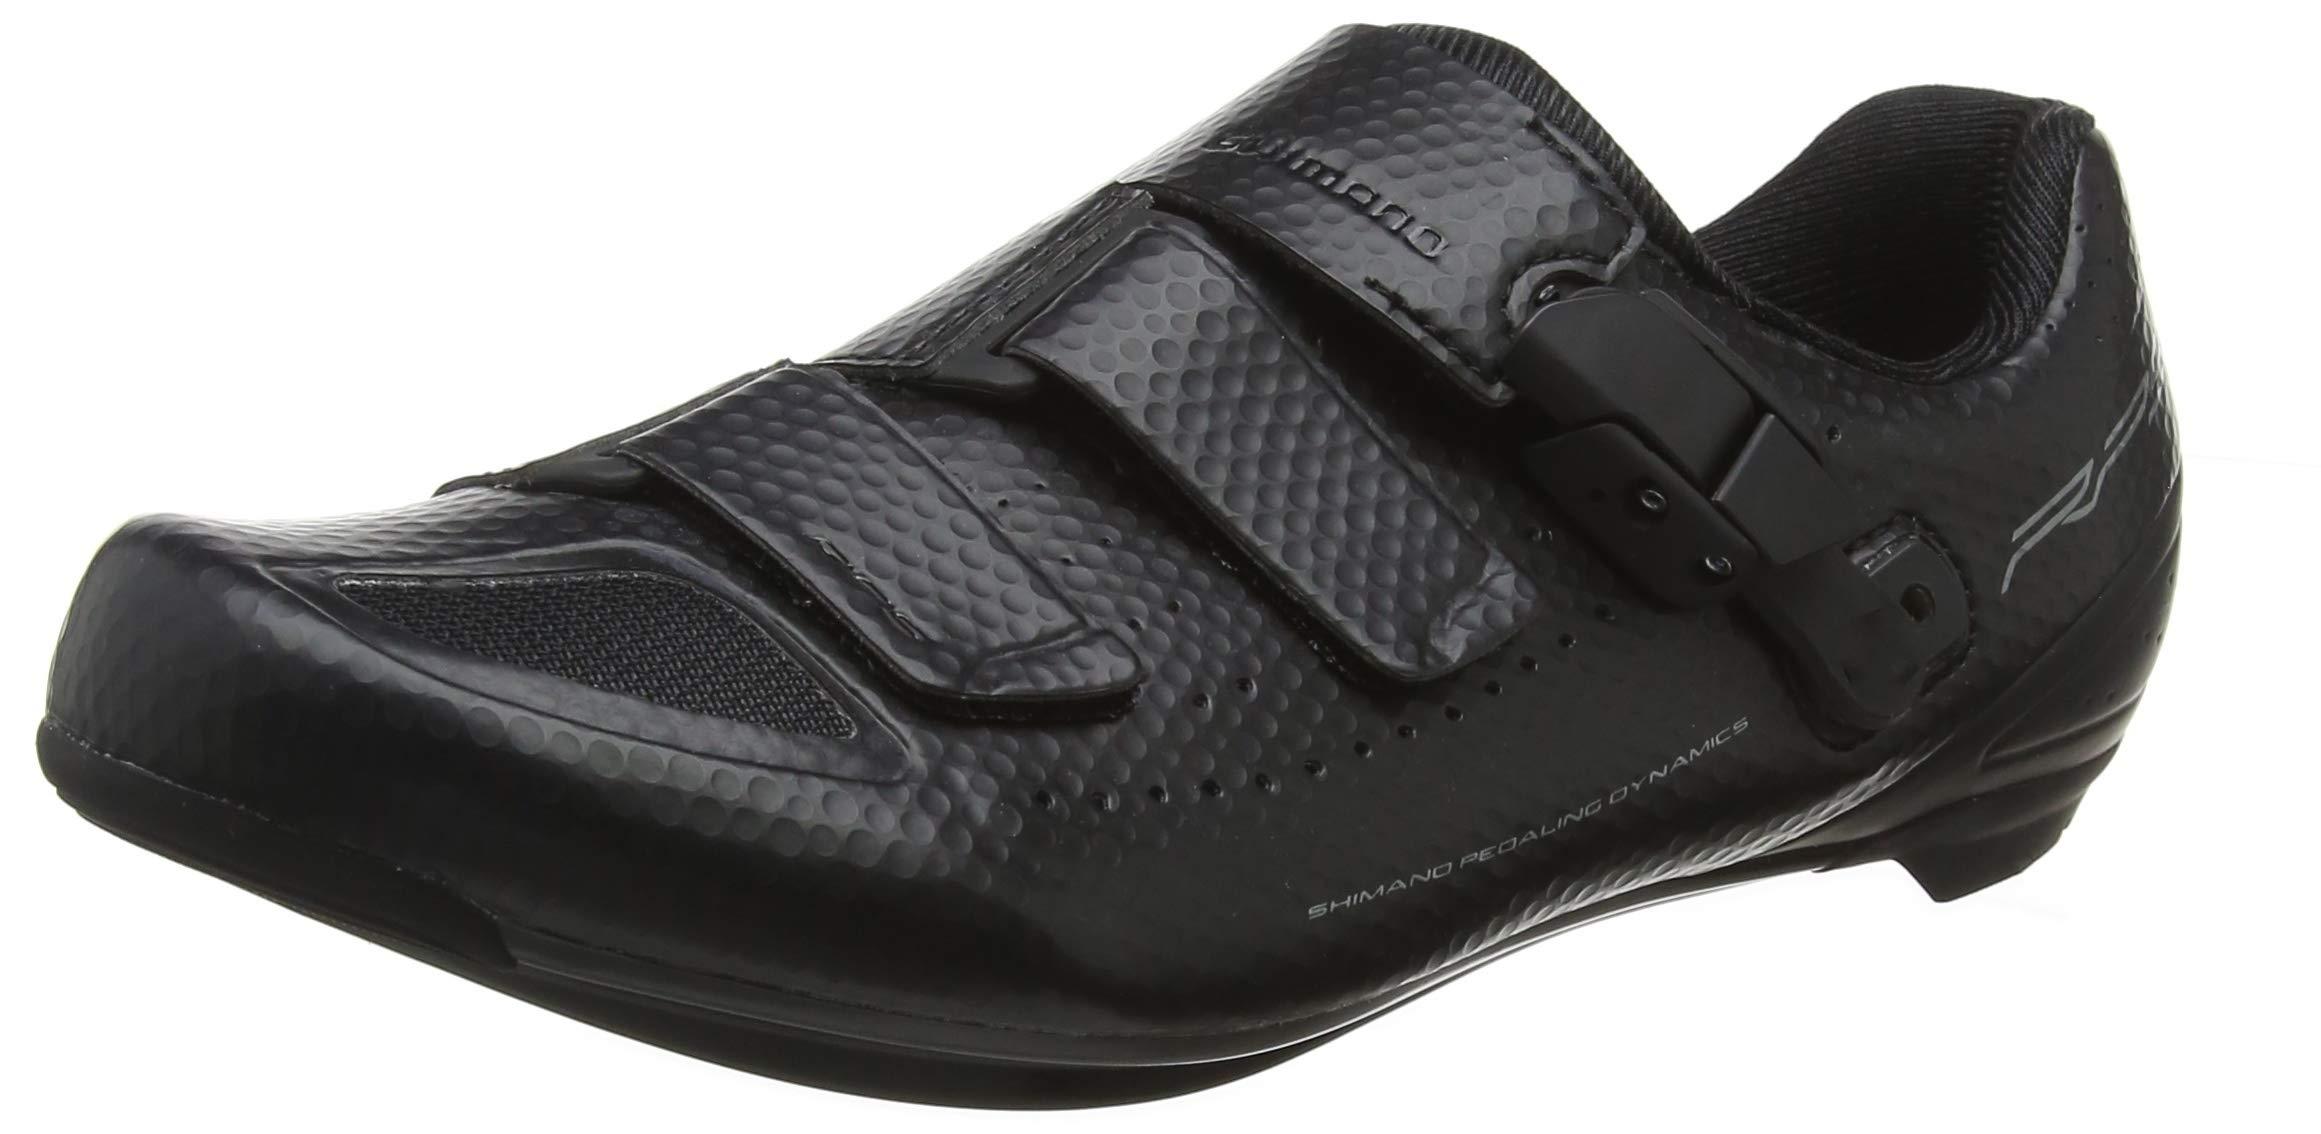 Shimano SH-RP5 Road Shoes 2016 43 Black